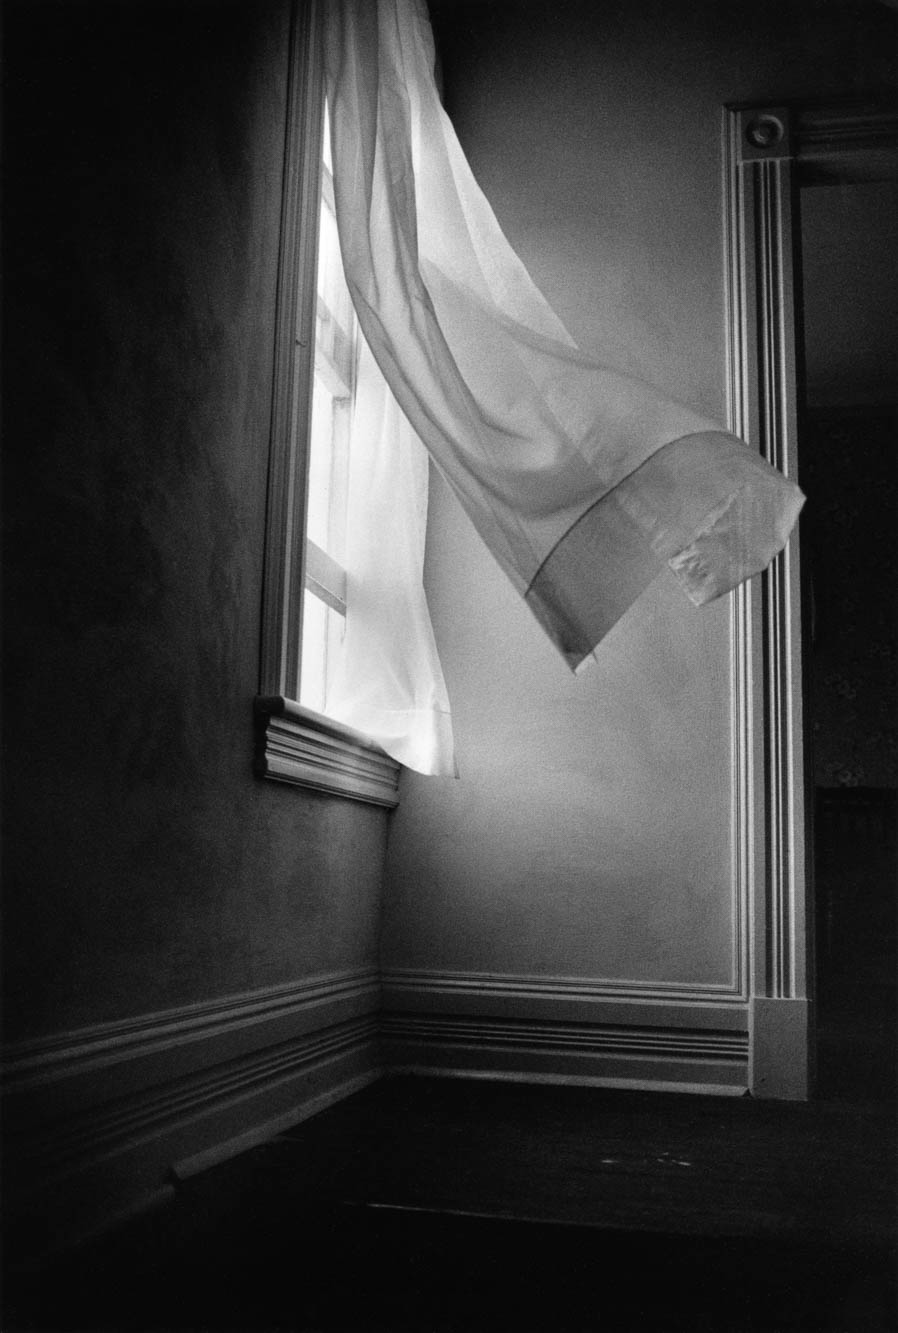 Copy of Breezy Curtains (Vermont), 1978